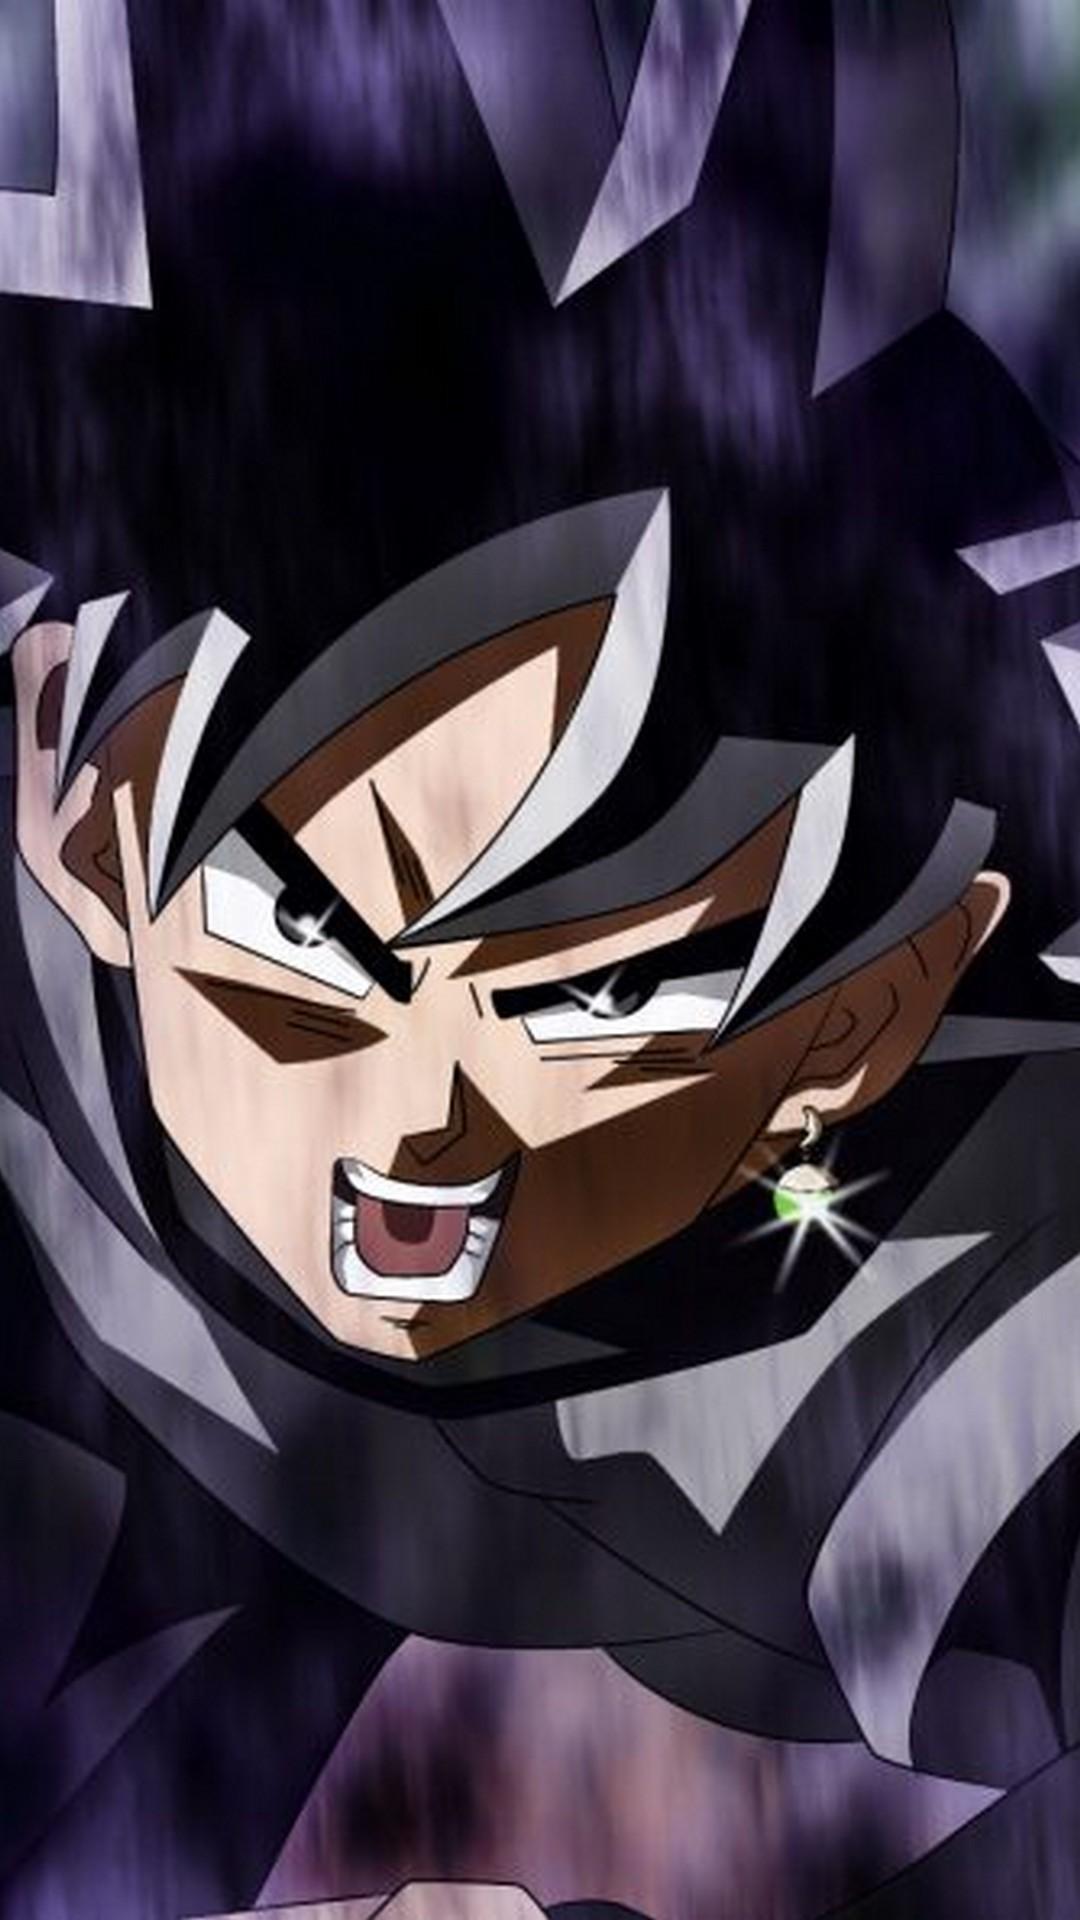 Start Download Goku Black Wallpaper Android 2080 Hd Wallpaper Backgrounds Download